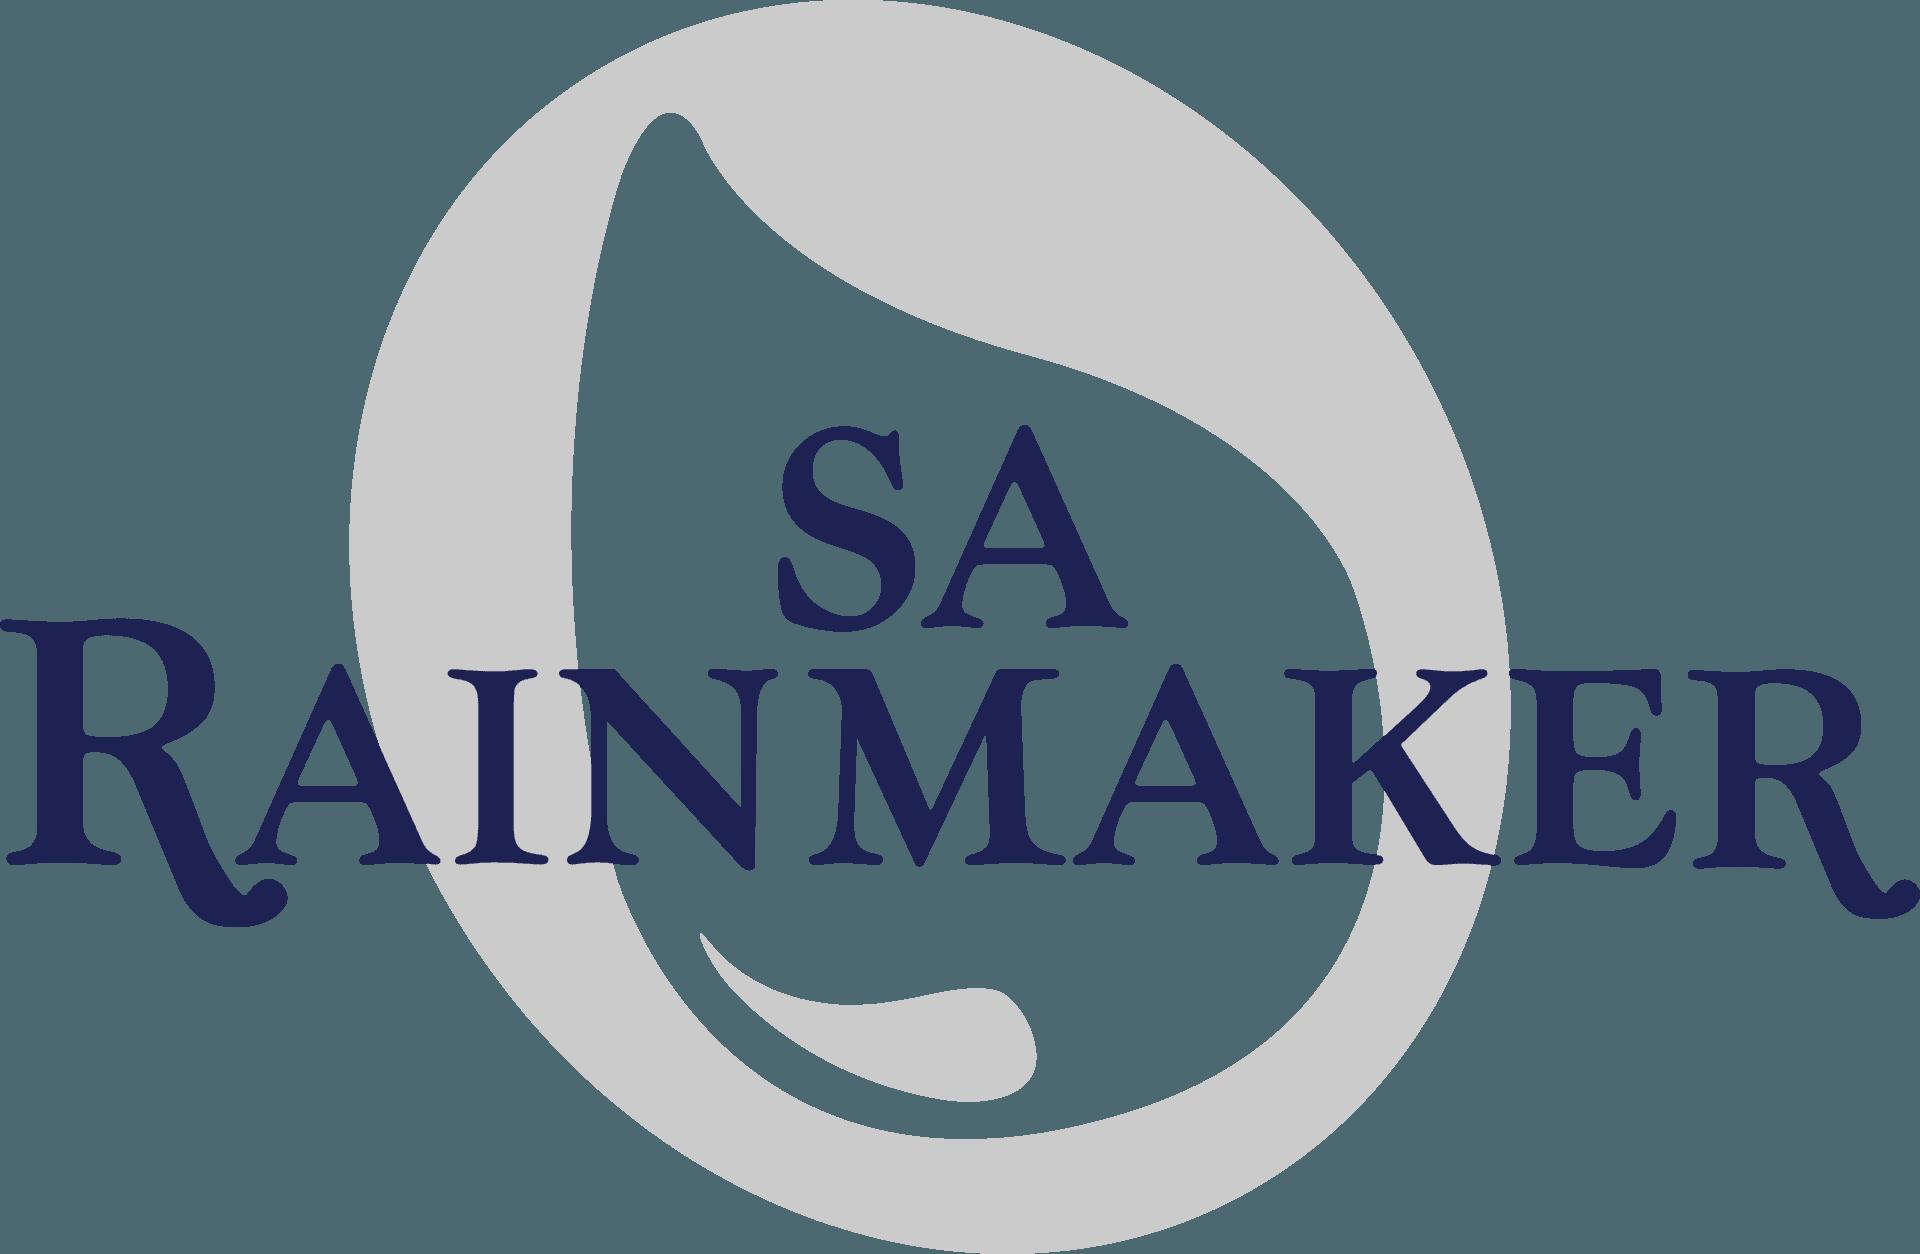 SA Rainmaker - Logo